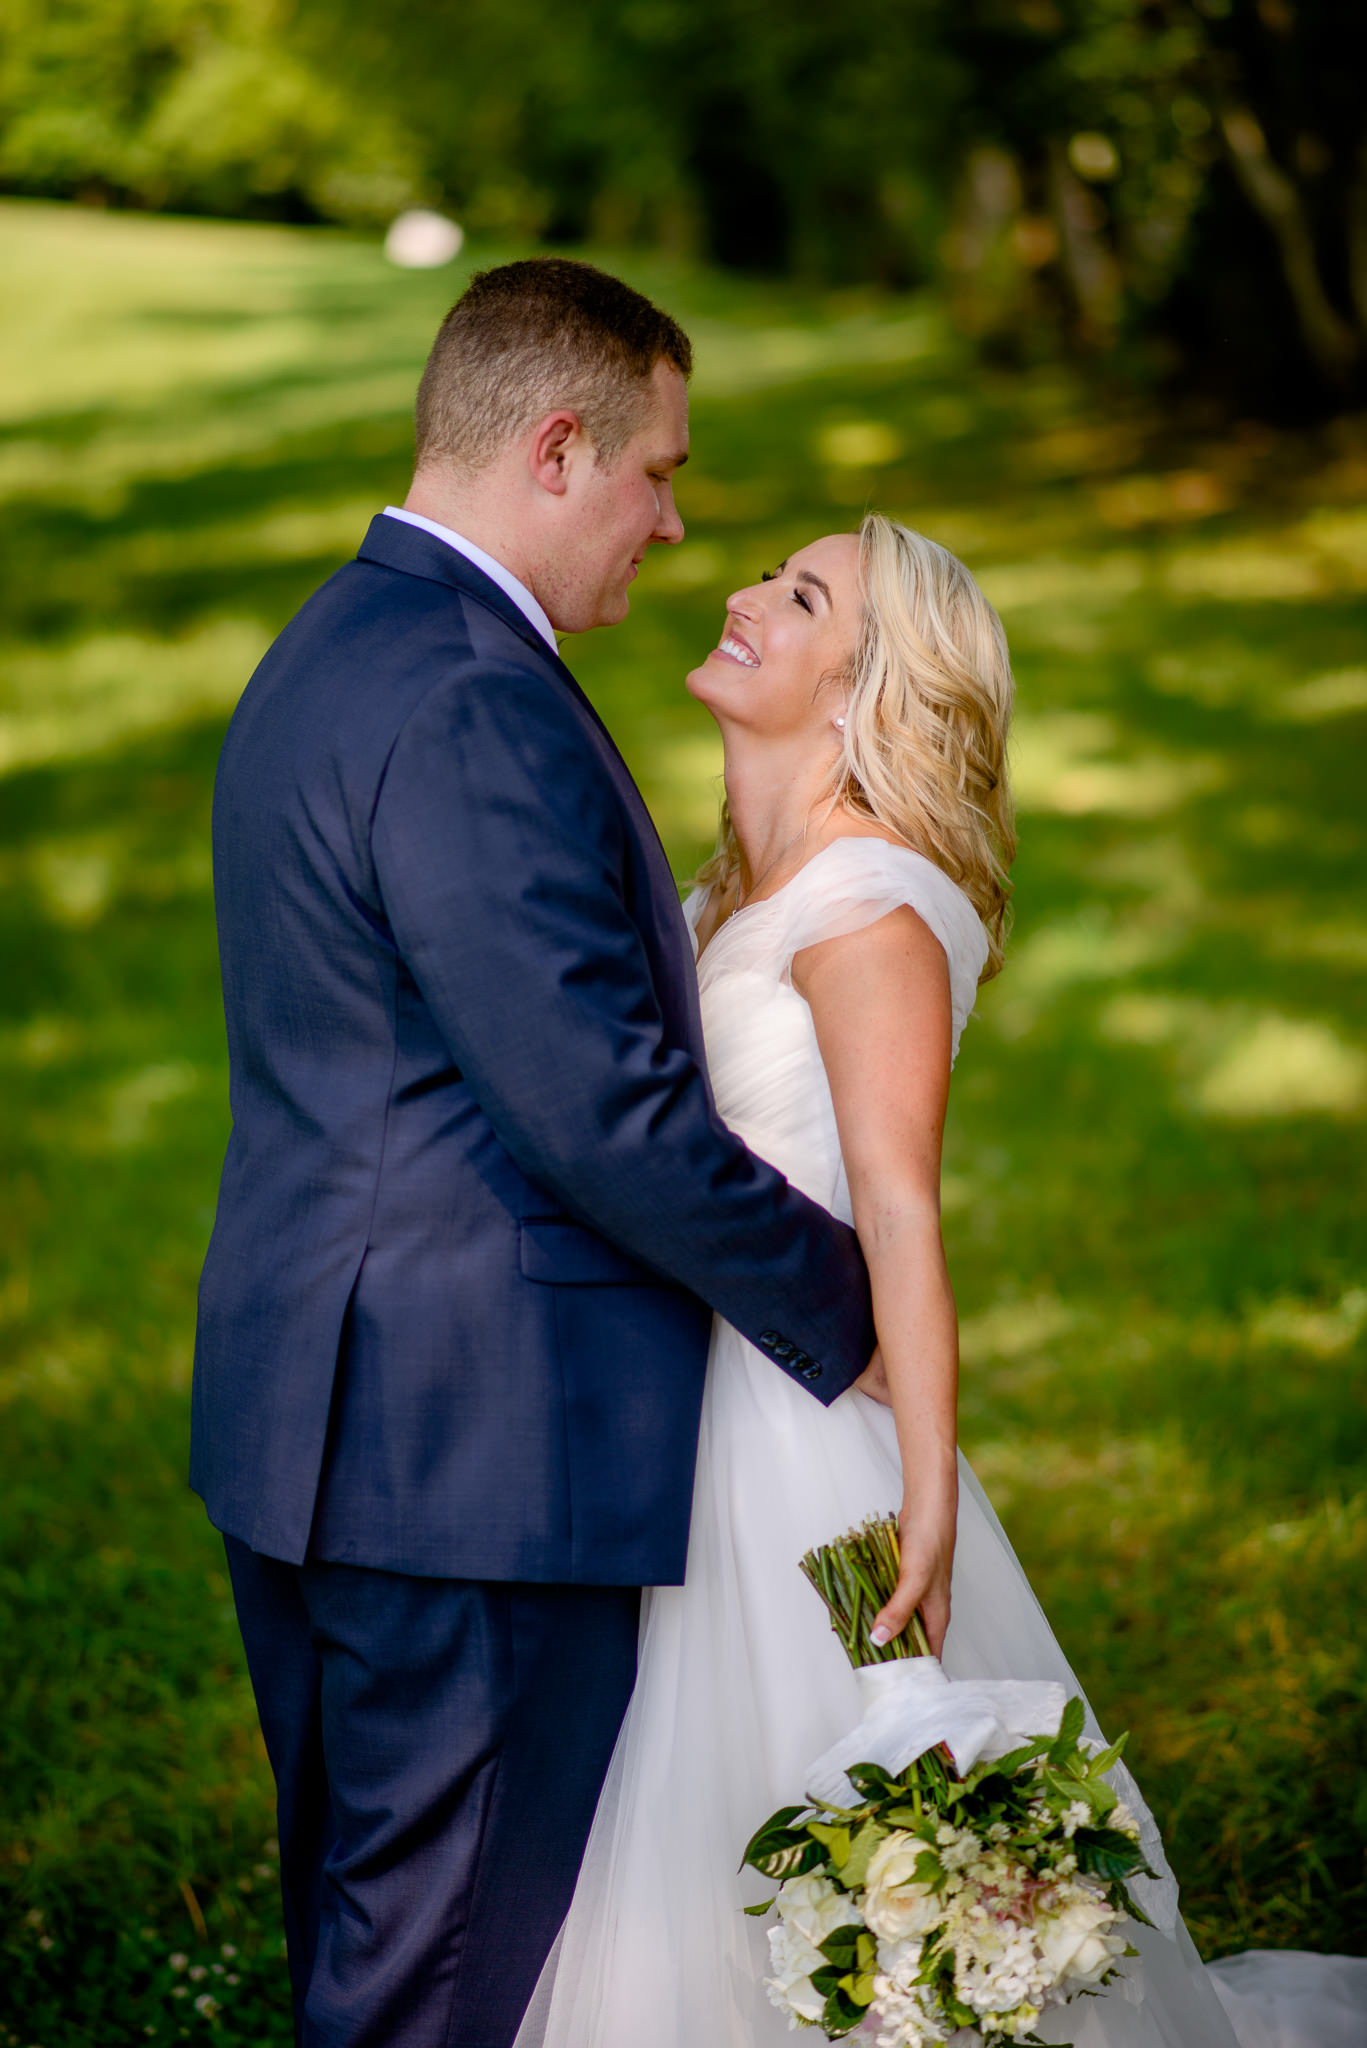 Greg and Jess Photography Nashville Portrait and Wedding Photographer 36.jpg